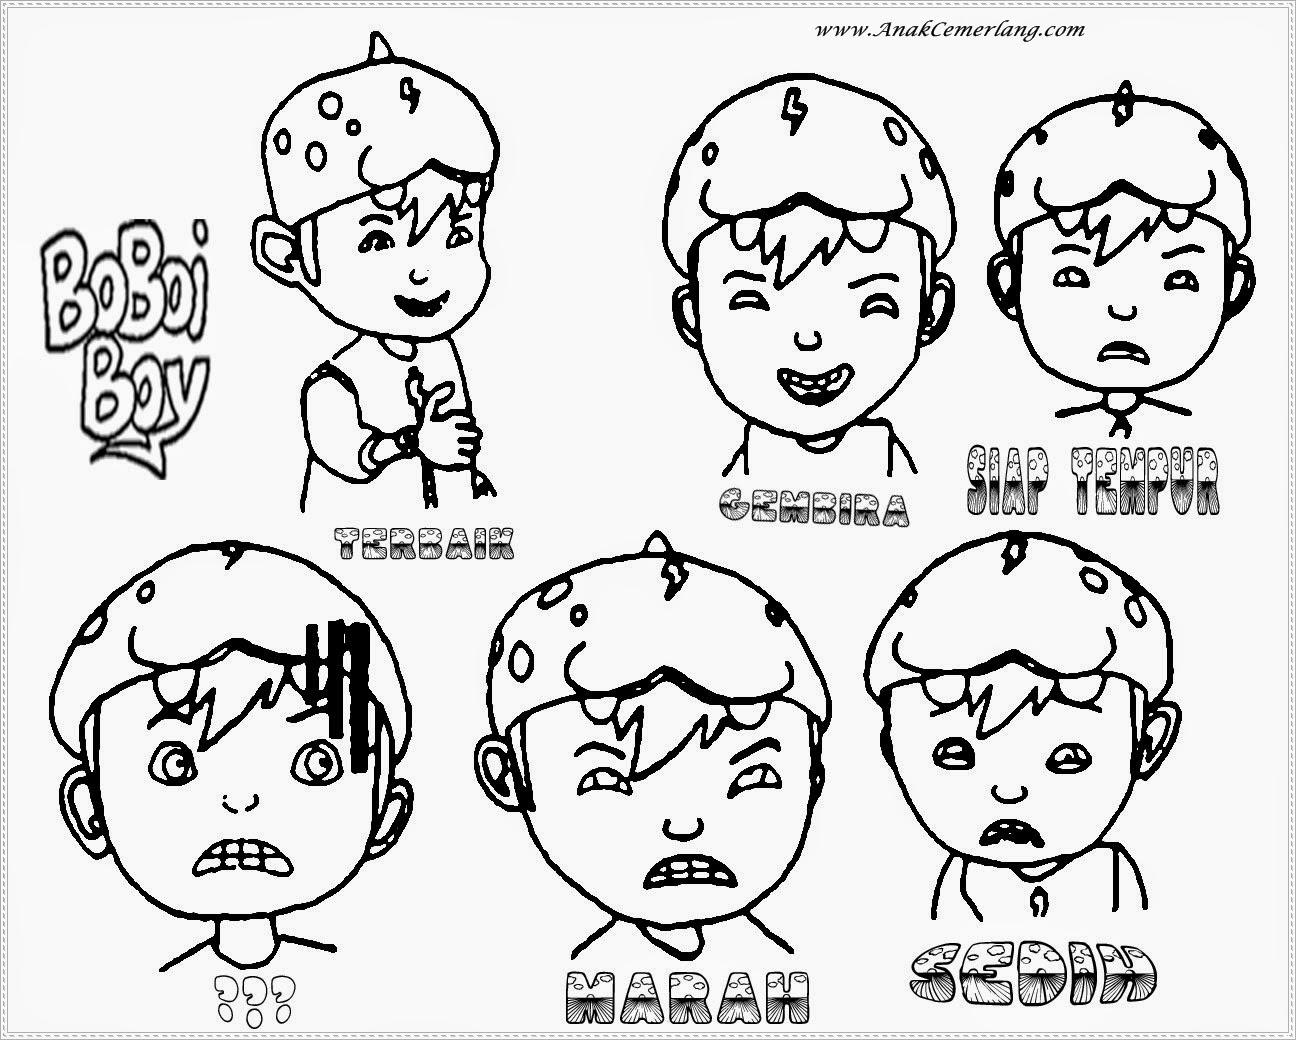 Gambar Mewarnai Boboiboy Bagian 2 | Anak Cemerlang